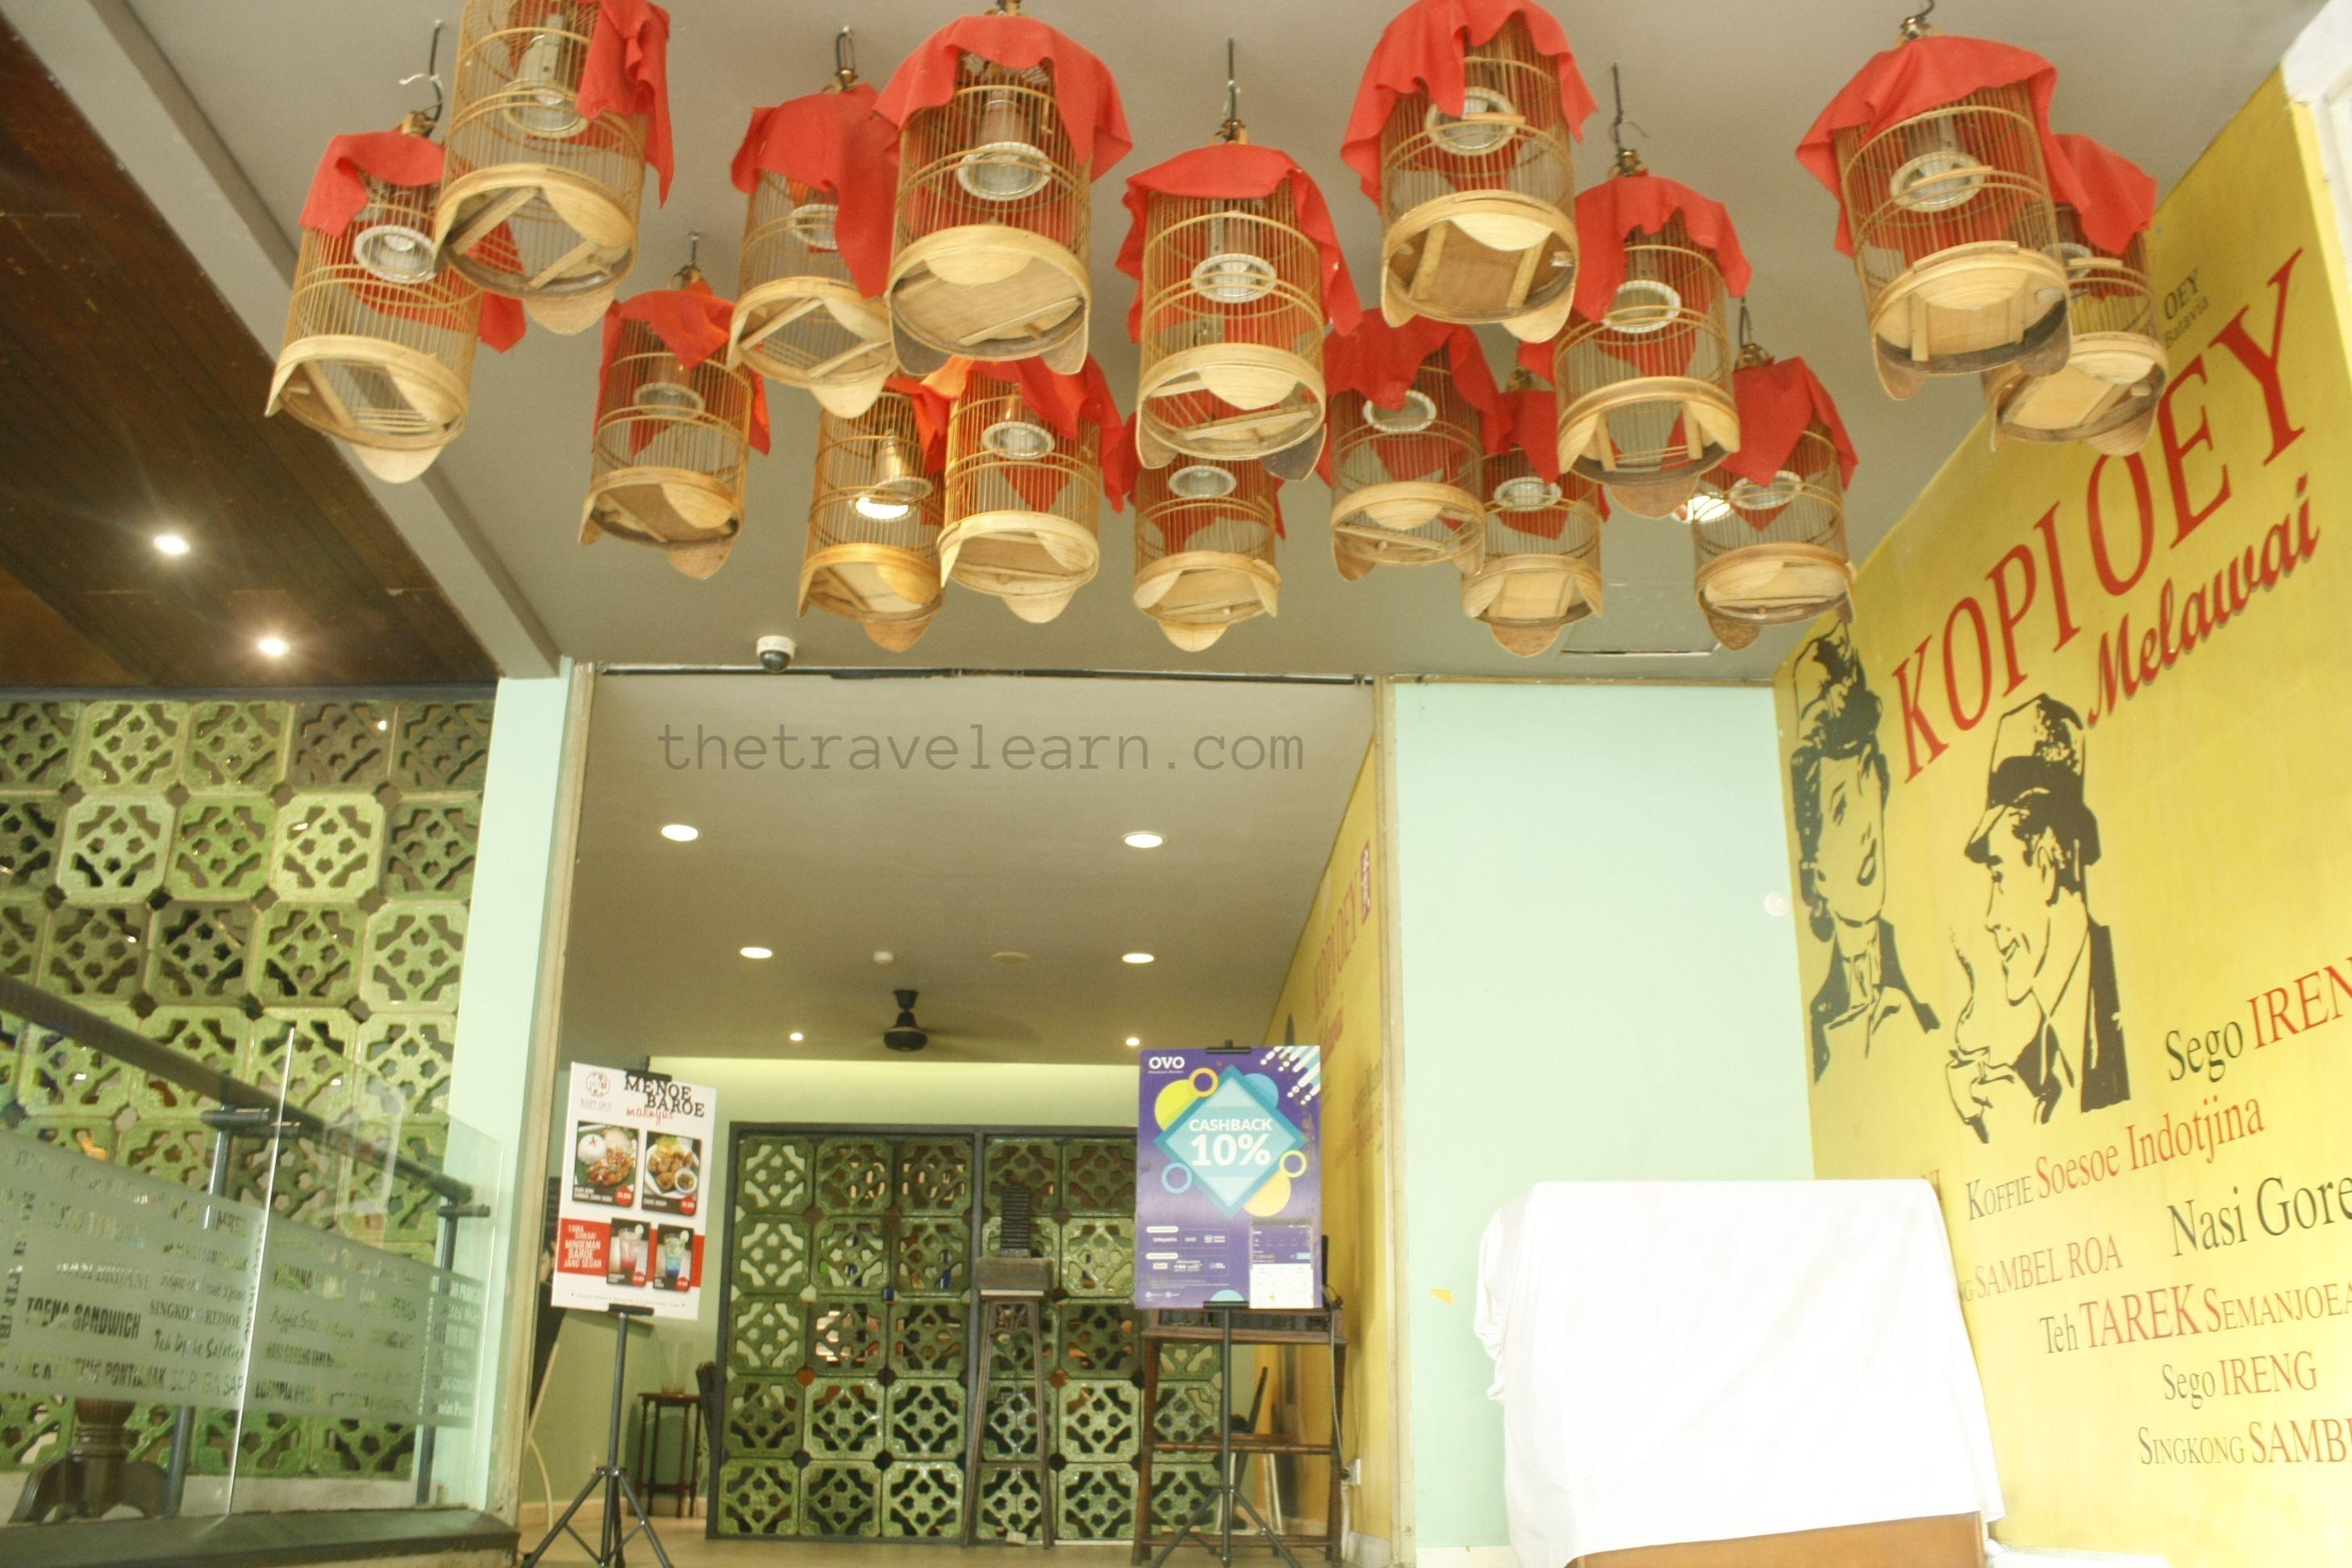 Favehotel Melawai Hotel Murah Dekat Stasiun Mrt Blok M Jakarta Selatan 4 The Travelearn